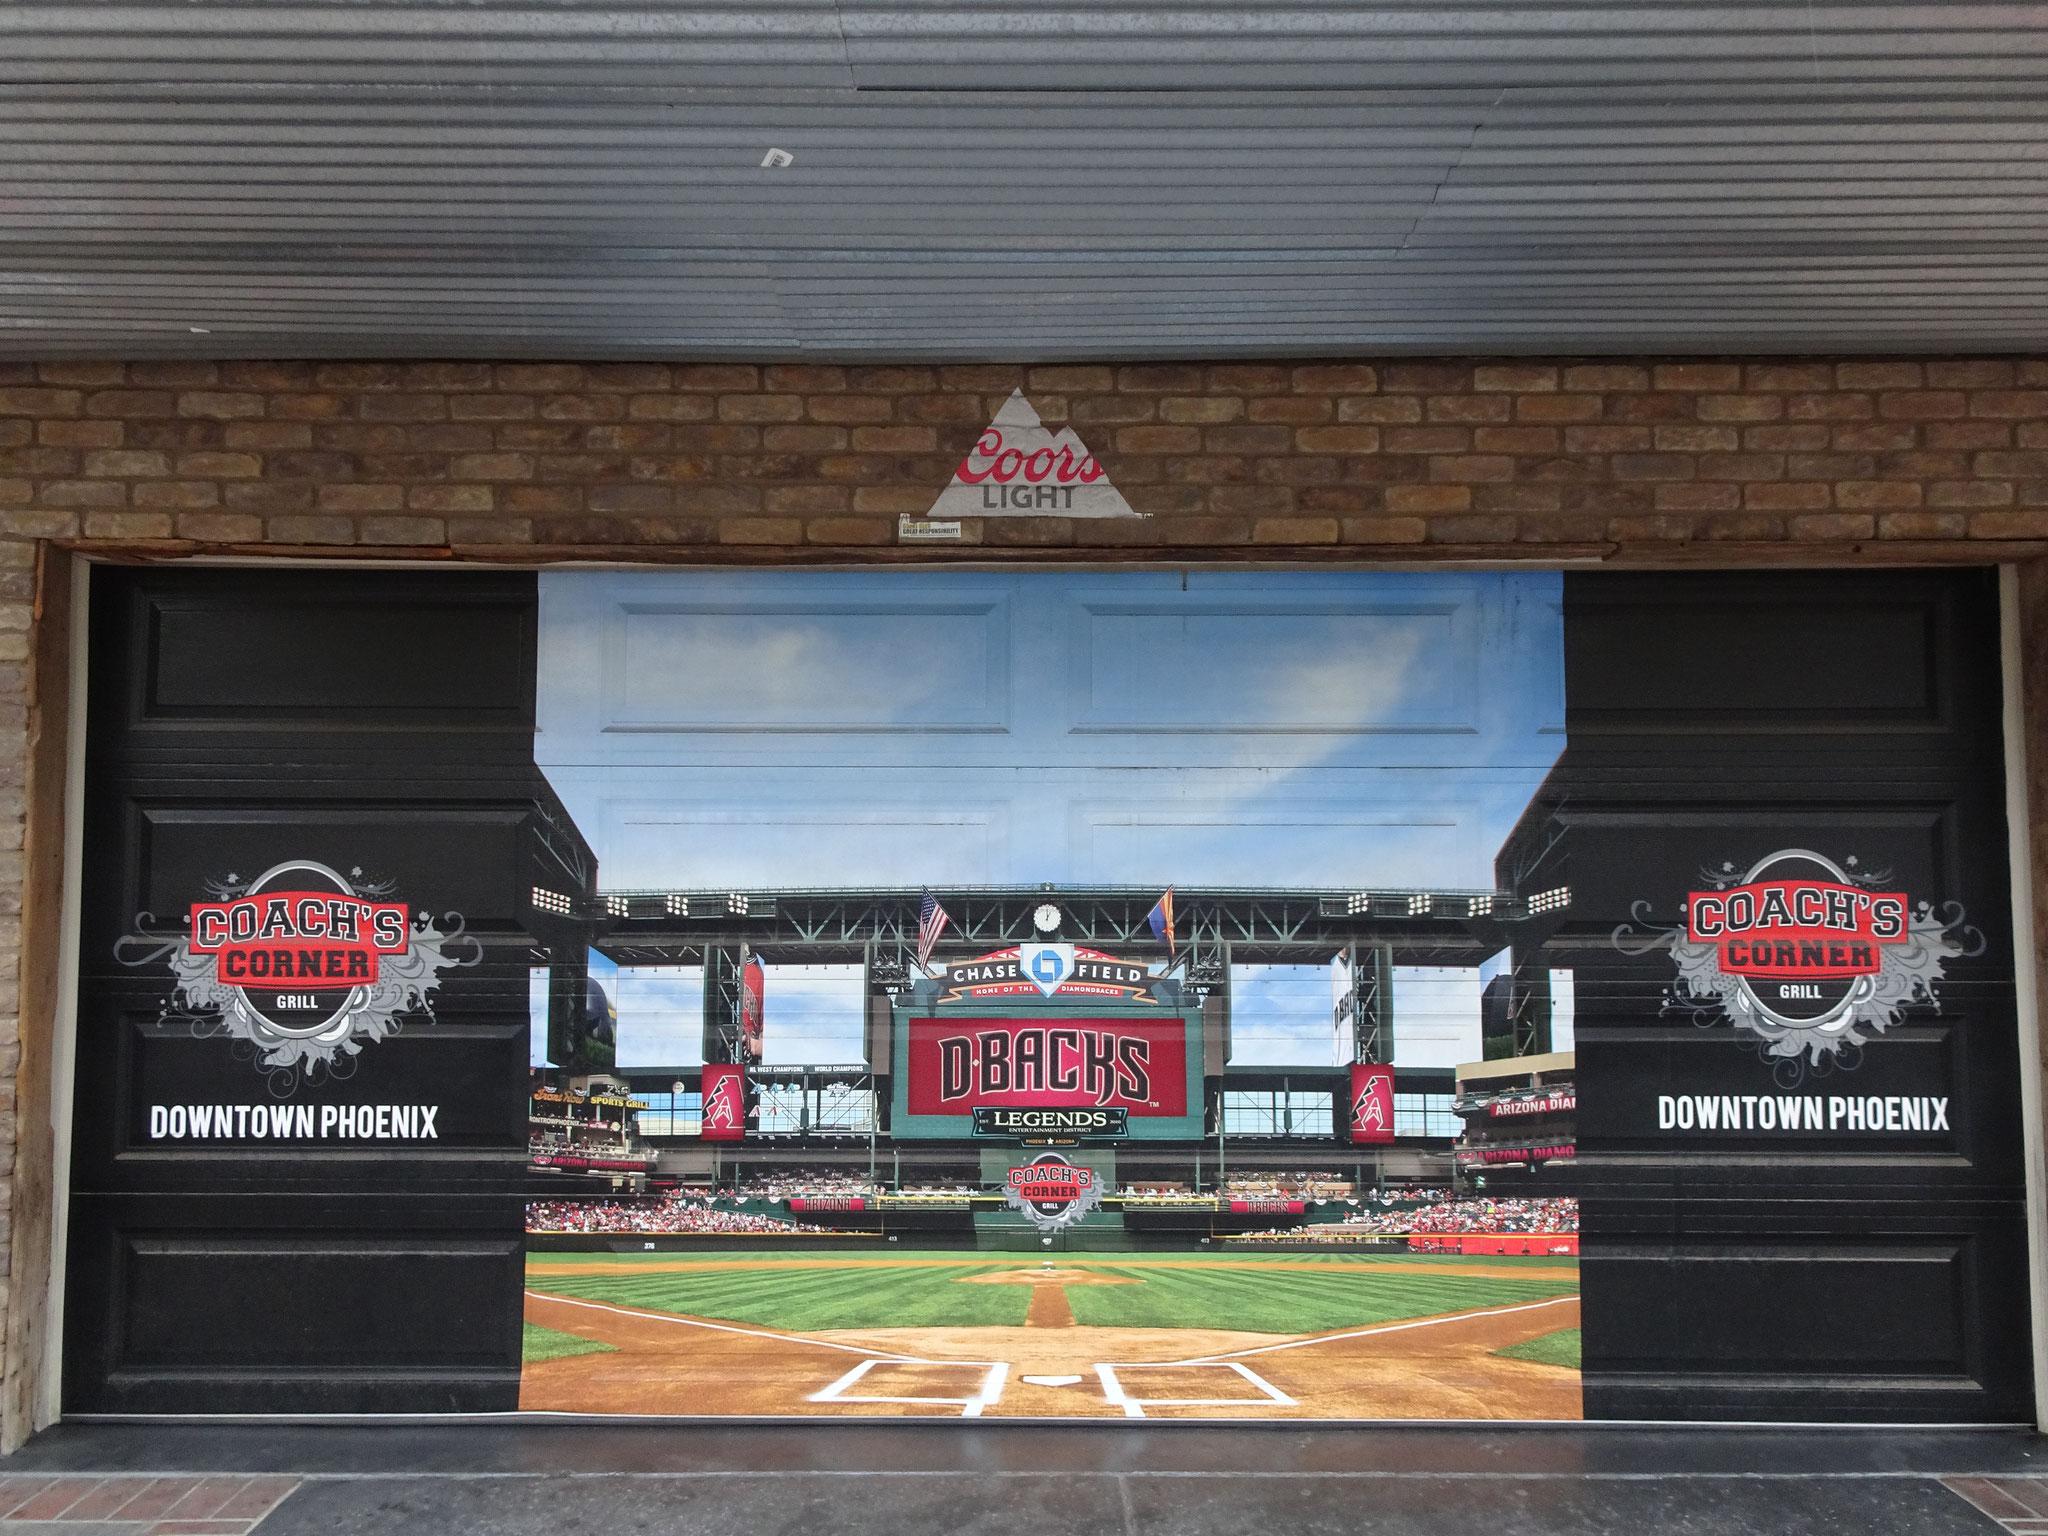 Arizona Dbacks Baseball Stadium situé à 100 mètres du TSRA